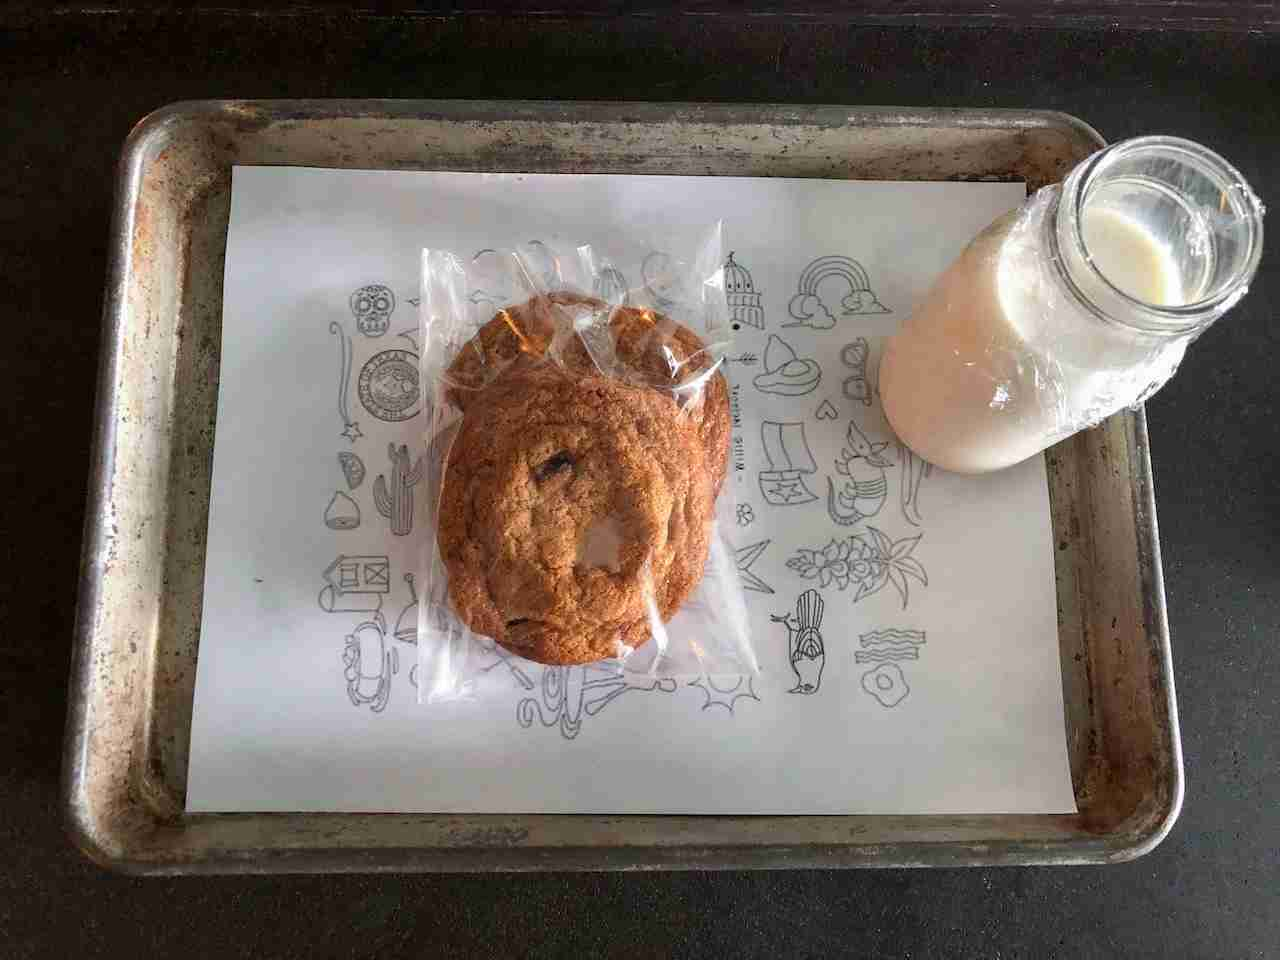 Free cookies sent up at the Kimpton Van Zandt